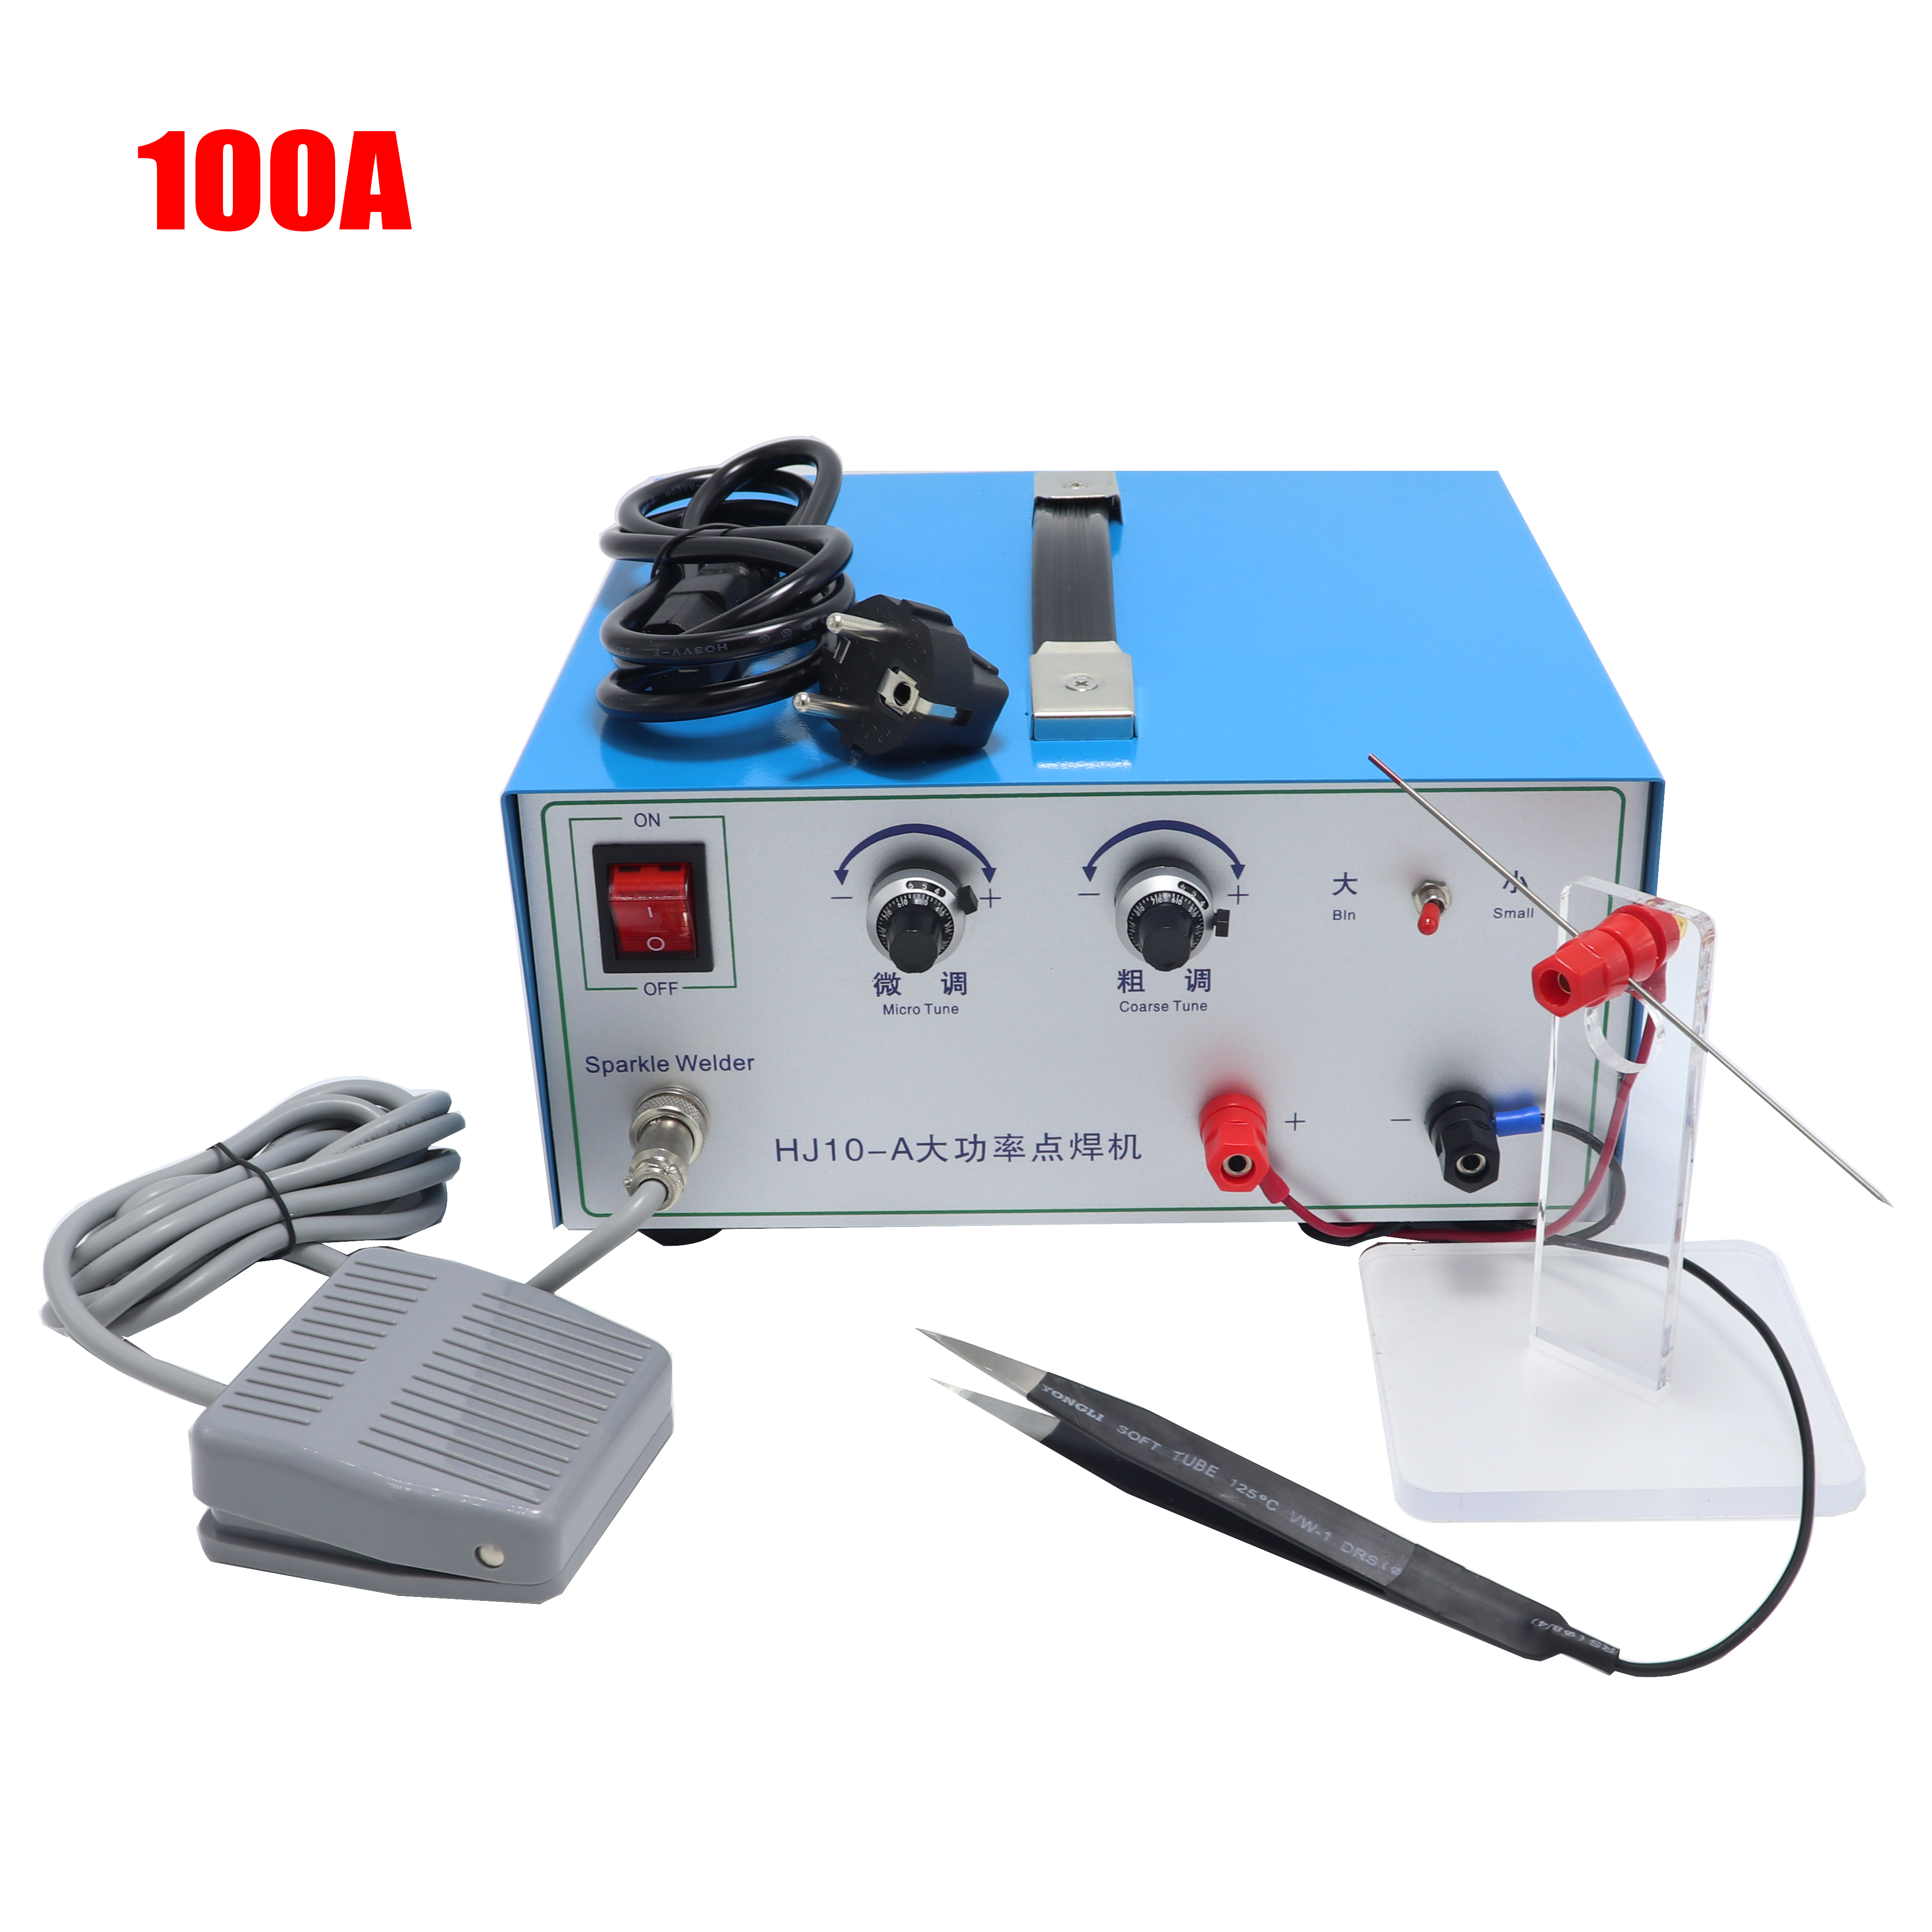 High Power 100A Jewelry Spot Welding Machine Handheld Small Laser Welding Machine Stainless Steel Welding